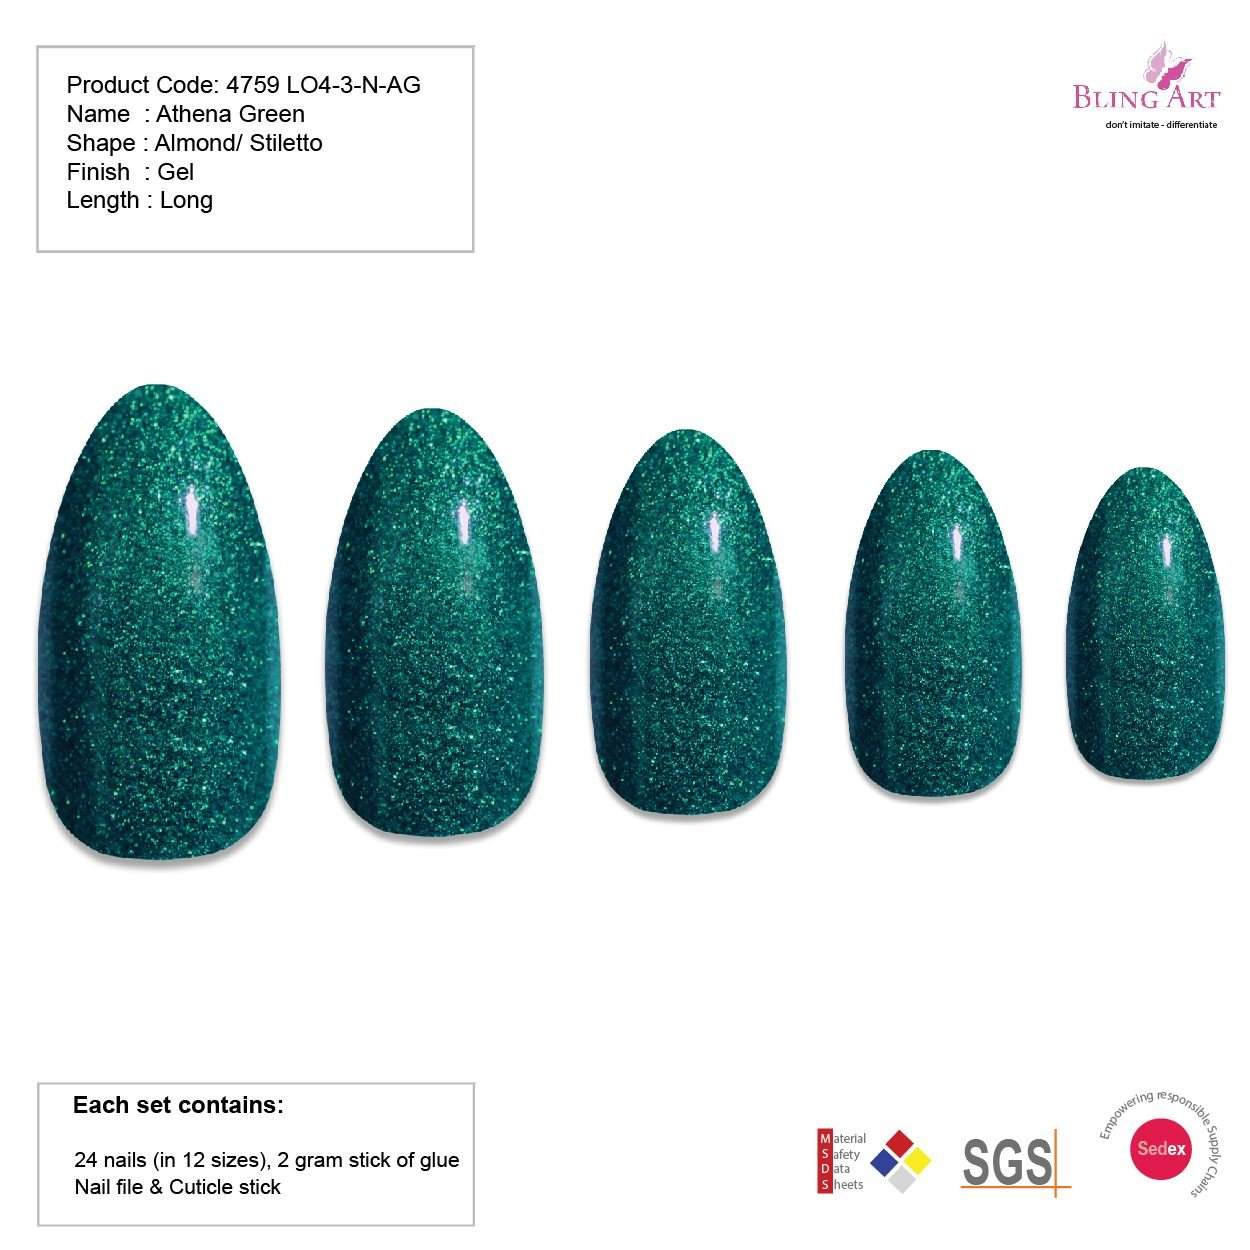 Amazon.com : Bling Art Almond False Nails Fake Stiletto Gel Green ...